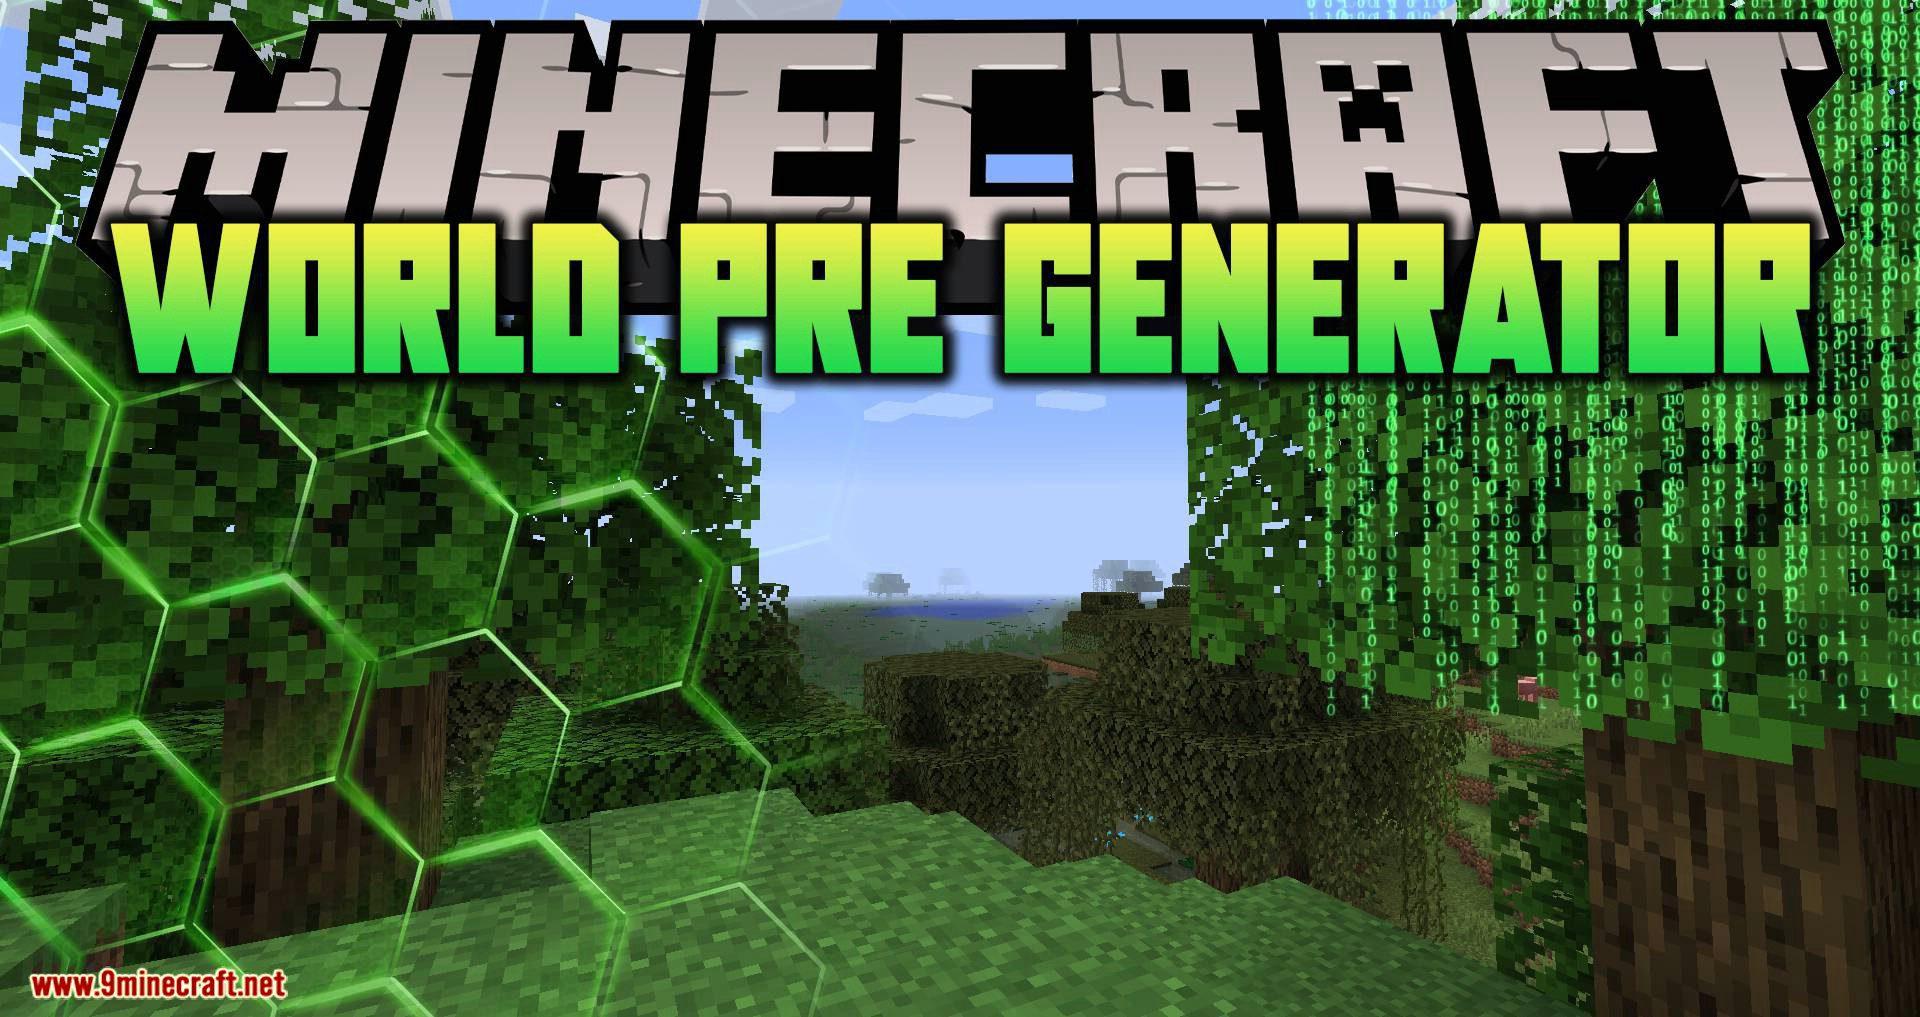 World Pre Generator mod for minecraft logo